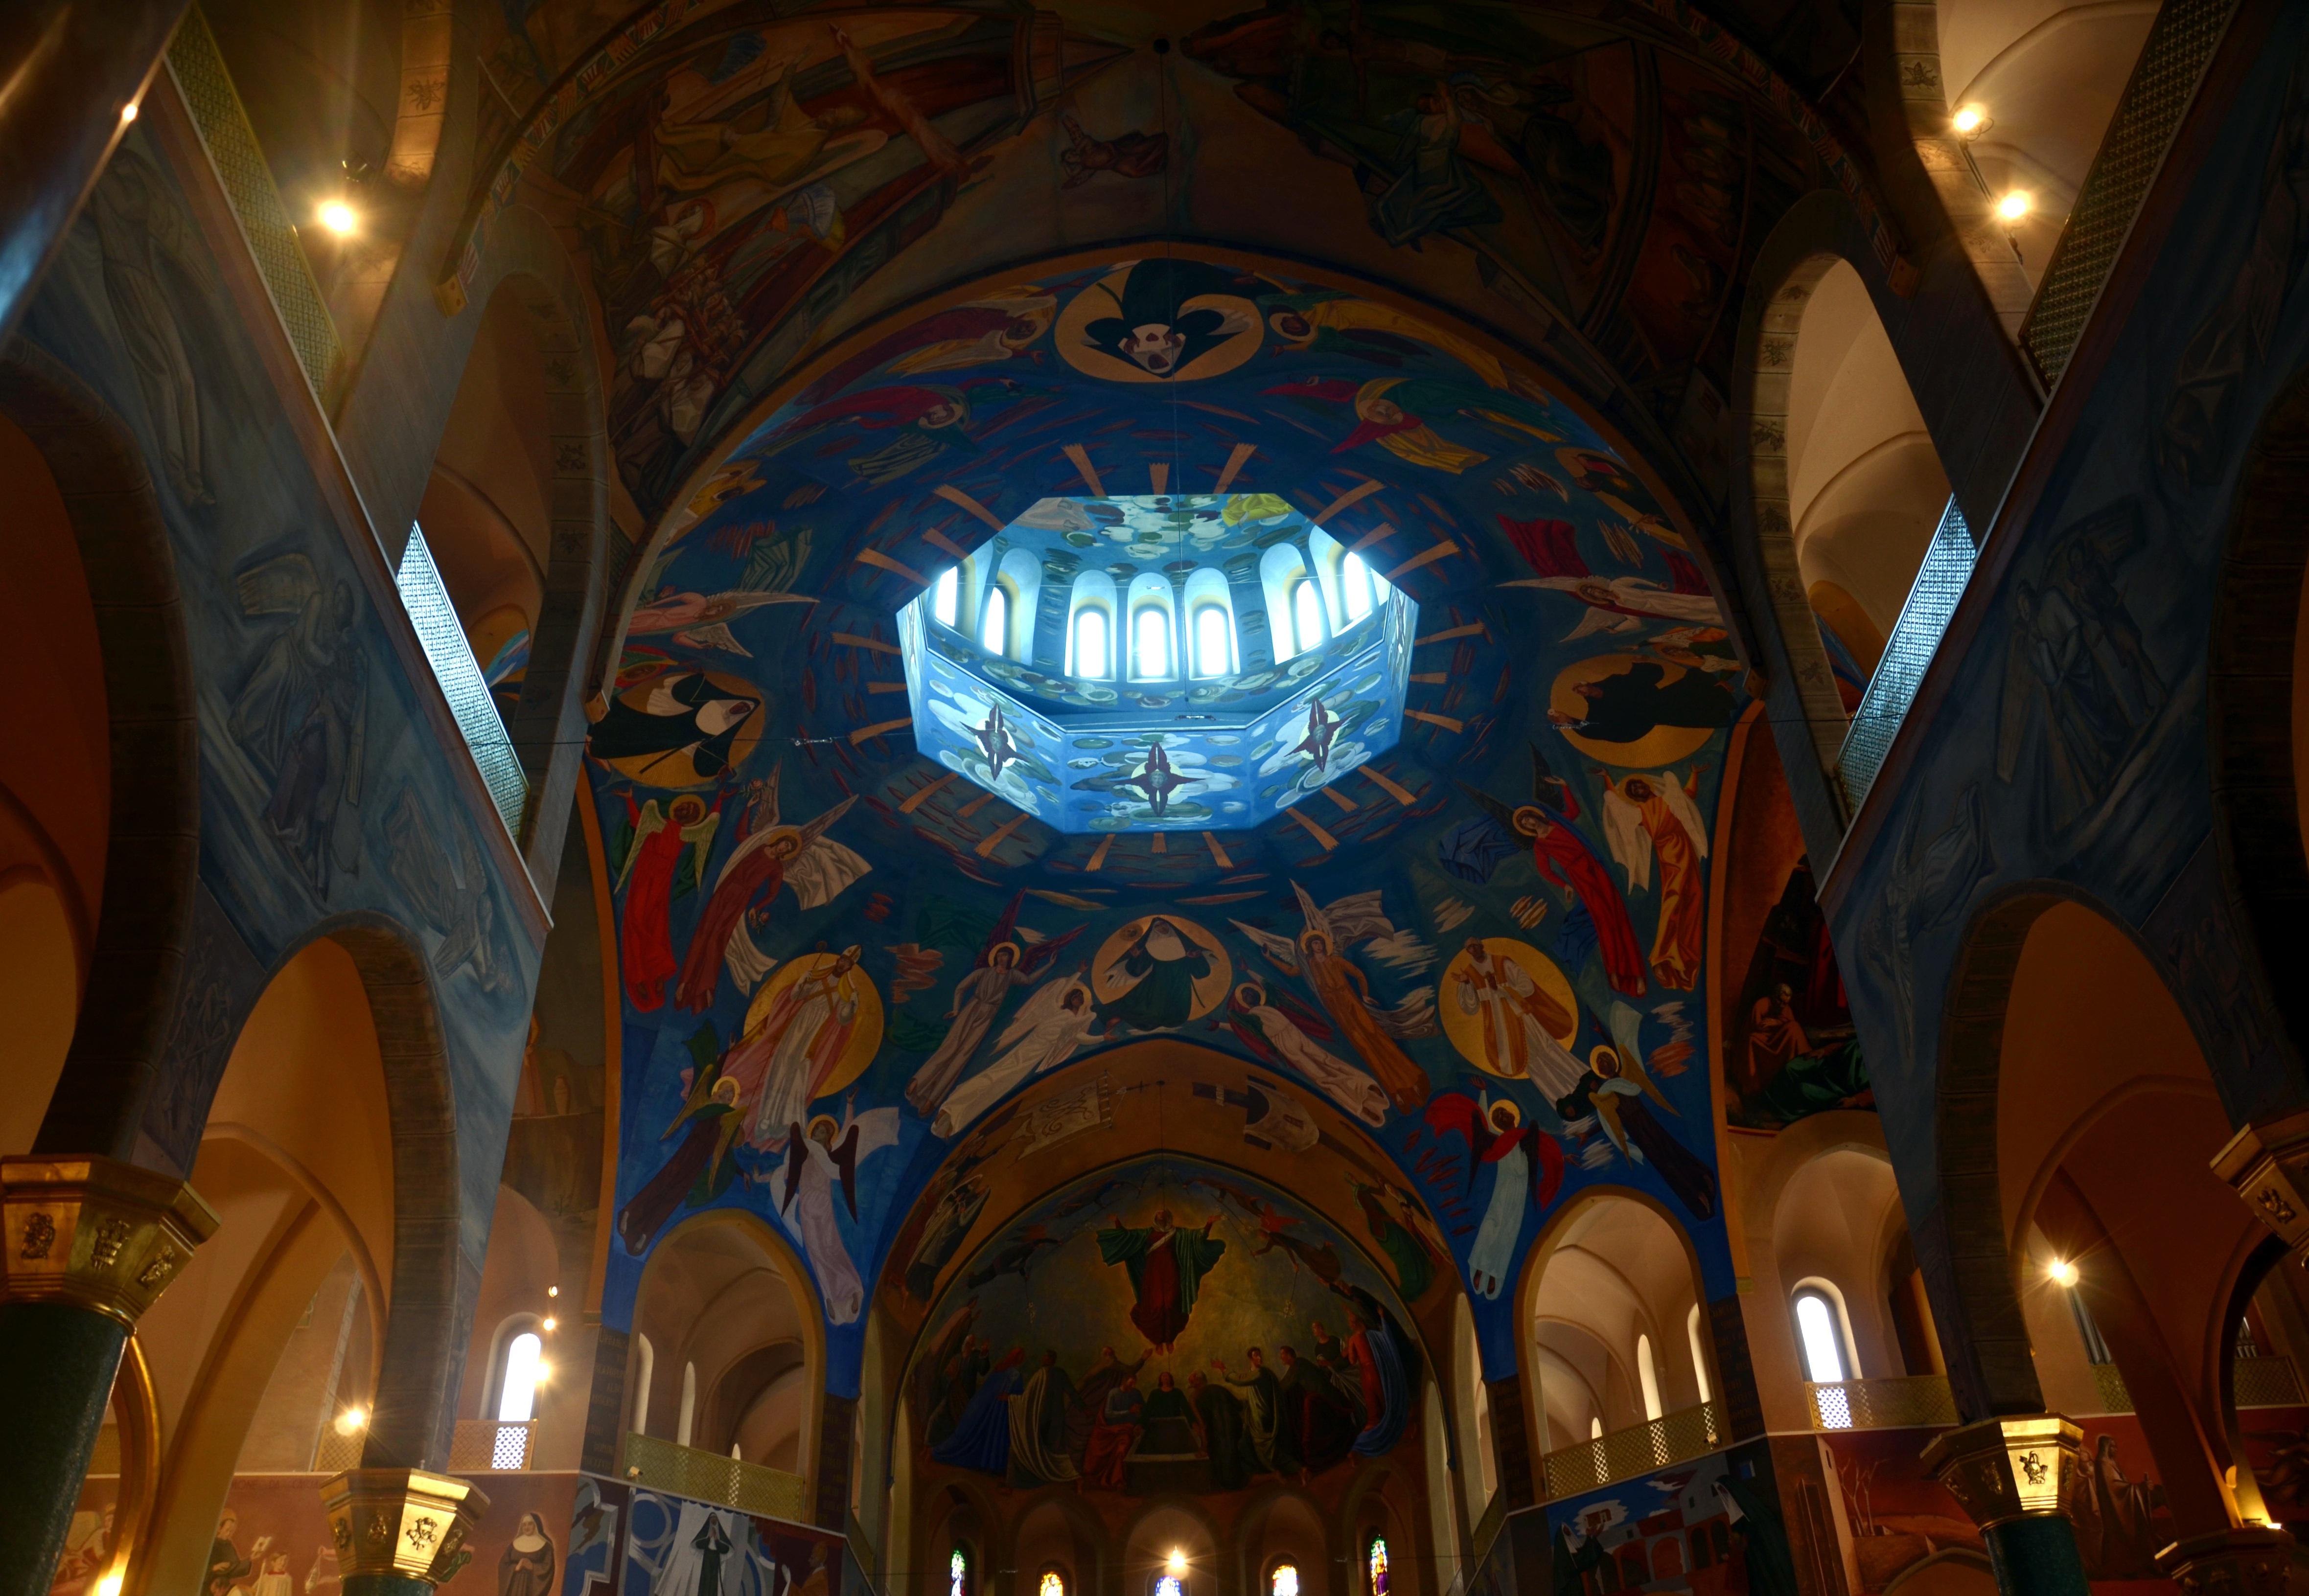 Fotograf Bina Fotograf Din Mavi Kilise Katedral Sapel